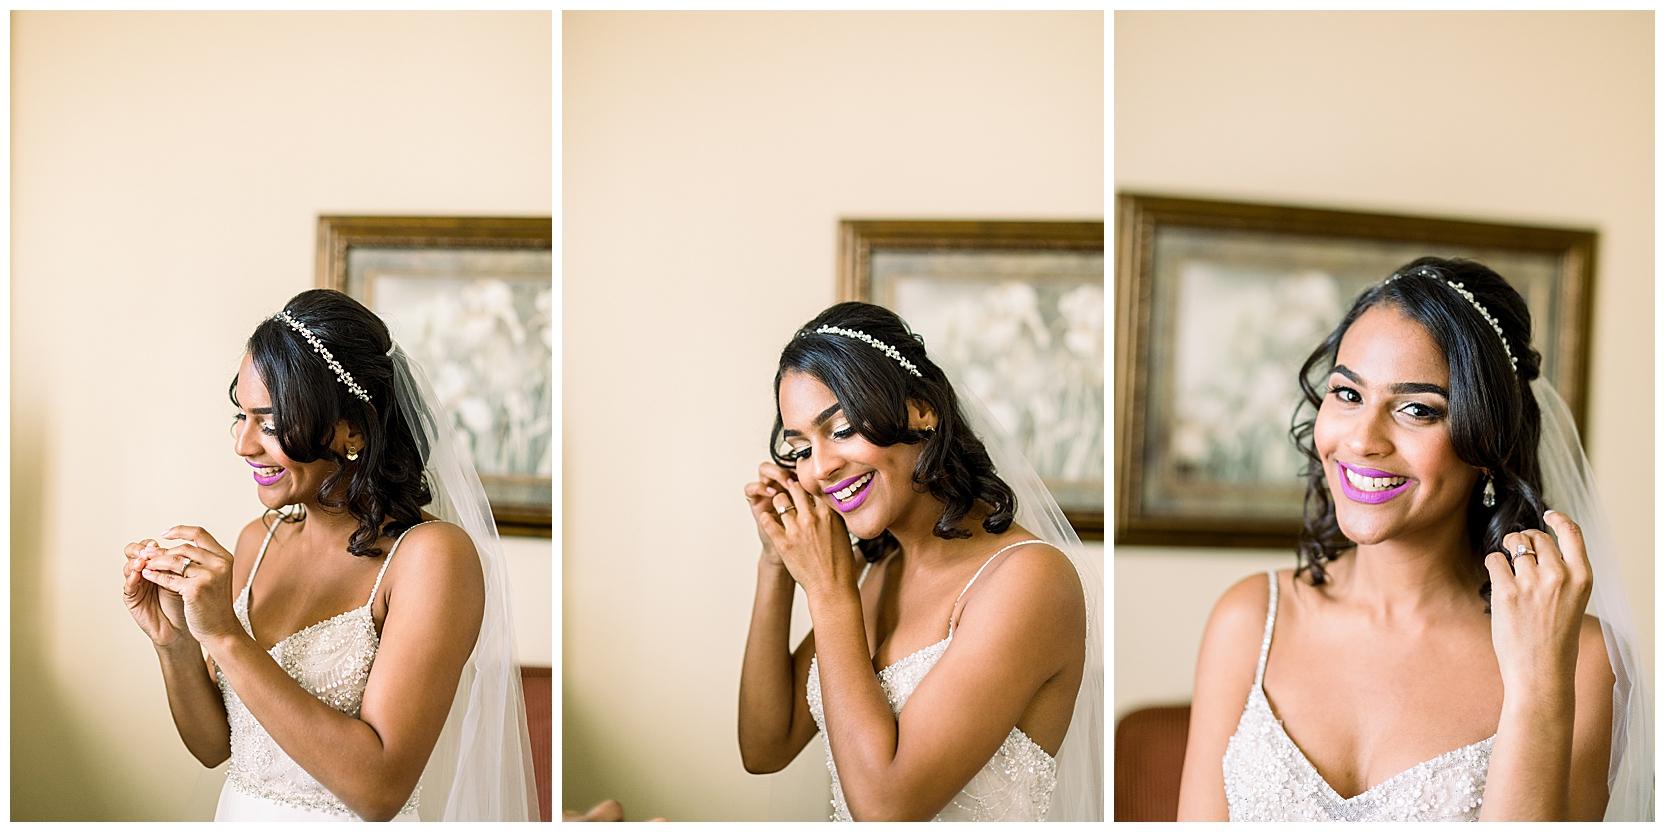 jessicafredericks_lakeland_tampa_wedding_purple_crazy hour_0012.jpg